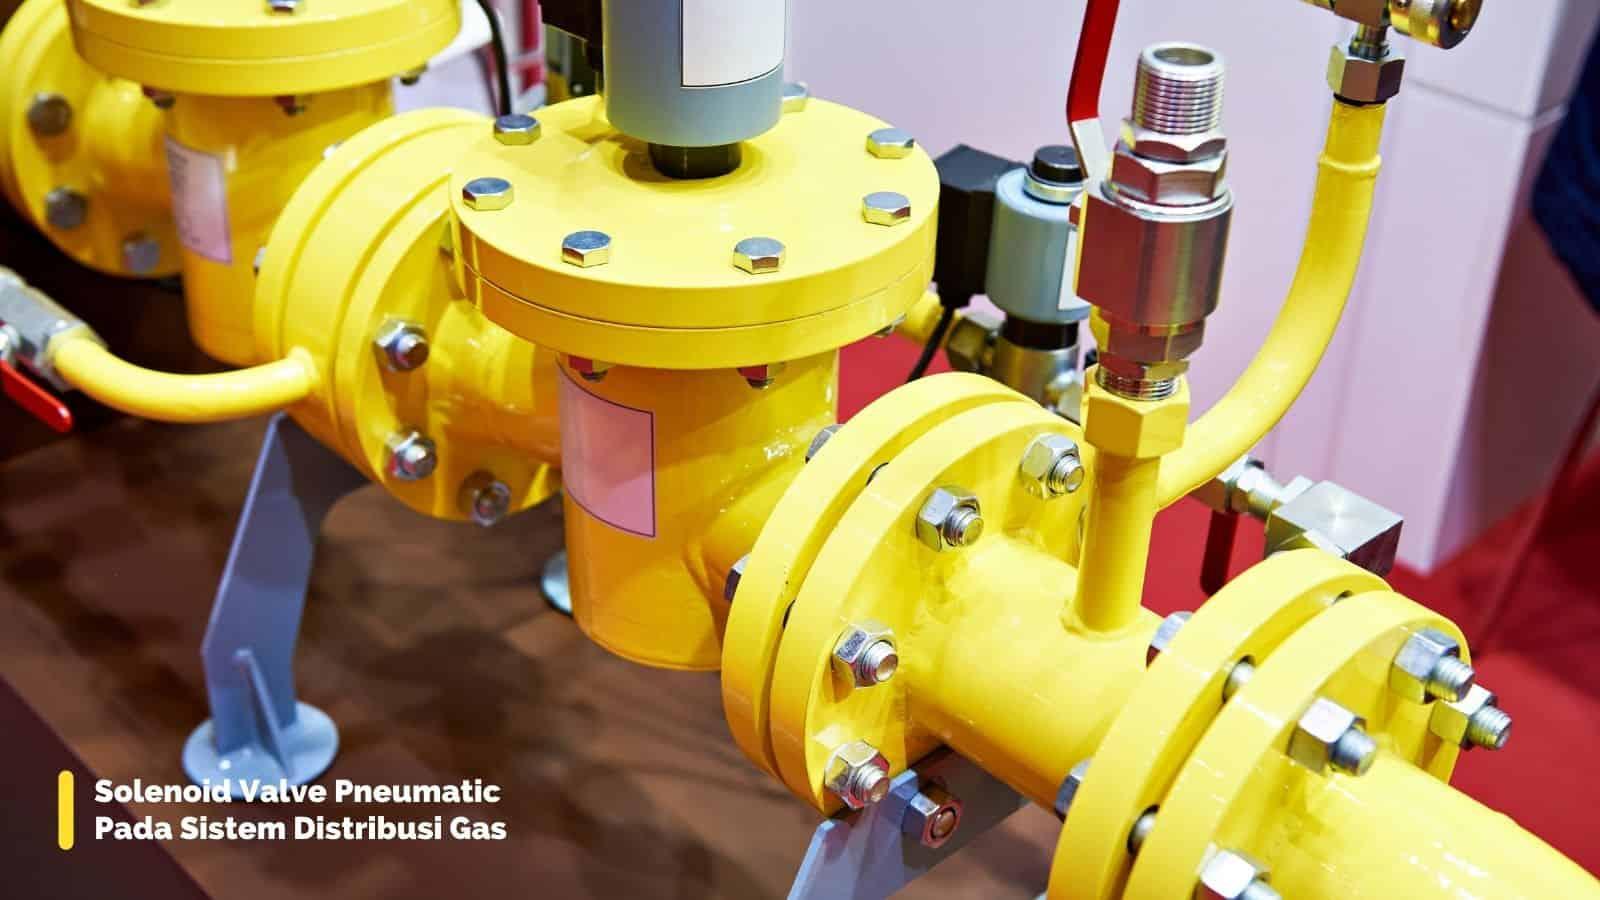 manfaat soleniod valve untuk sistem distribusi gas